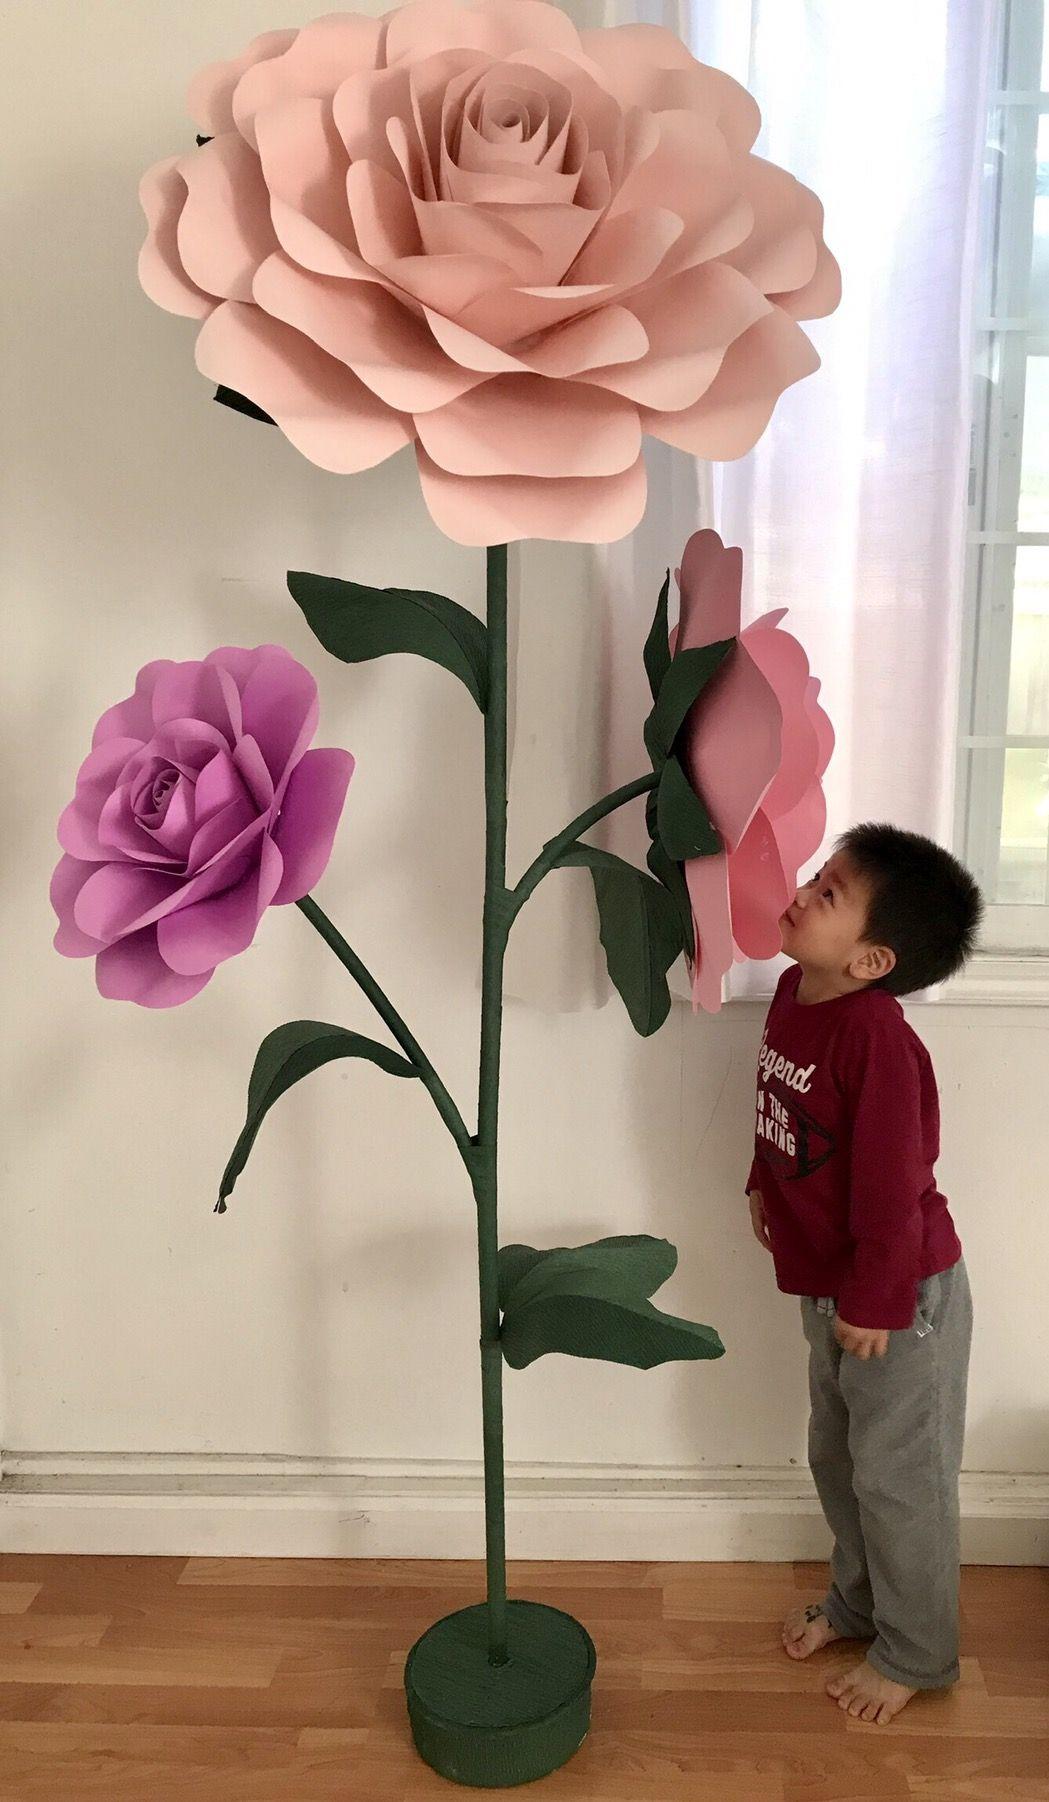 This Giant Paper Flowers Diy Stem Set Tutorials Includes Videos